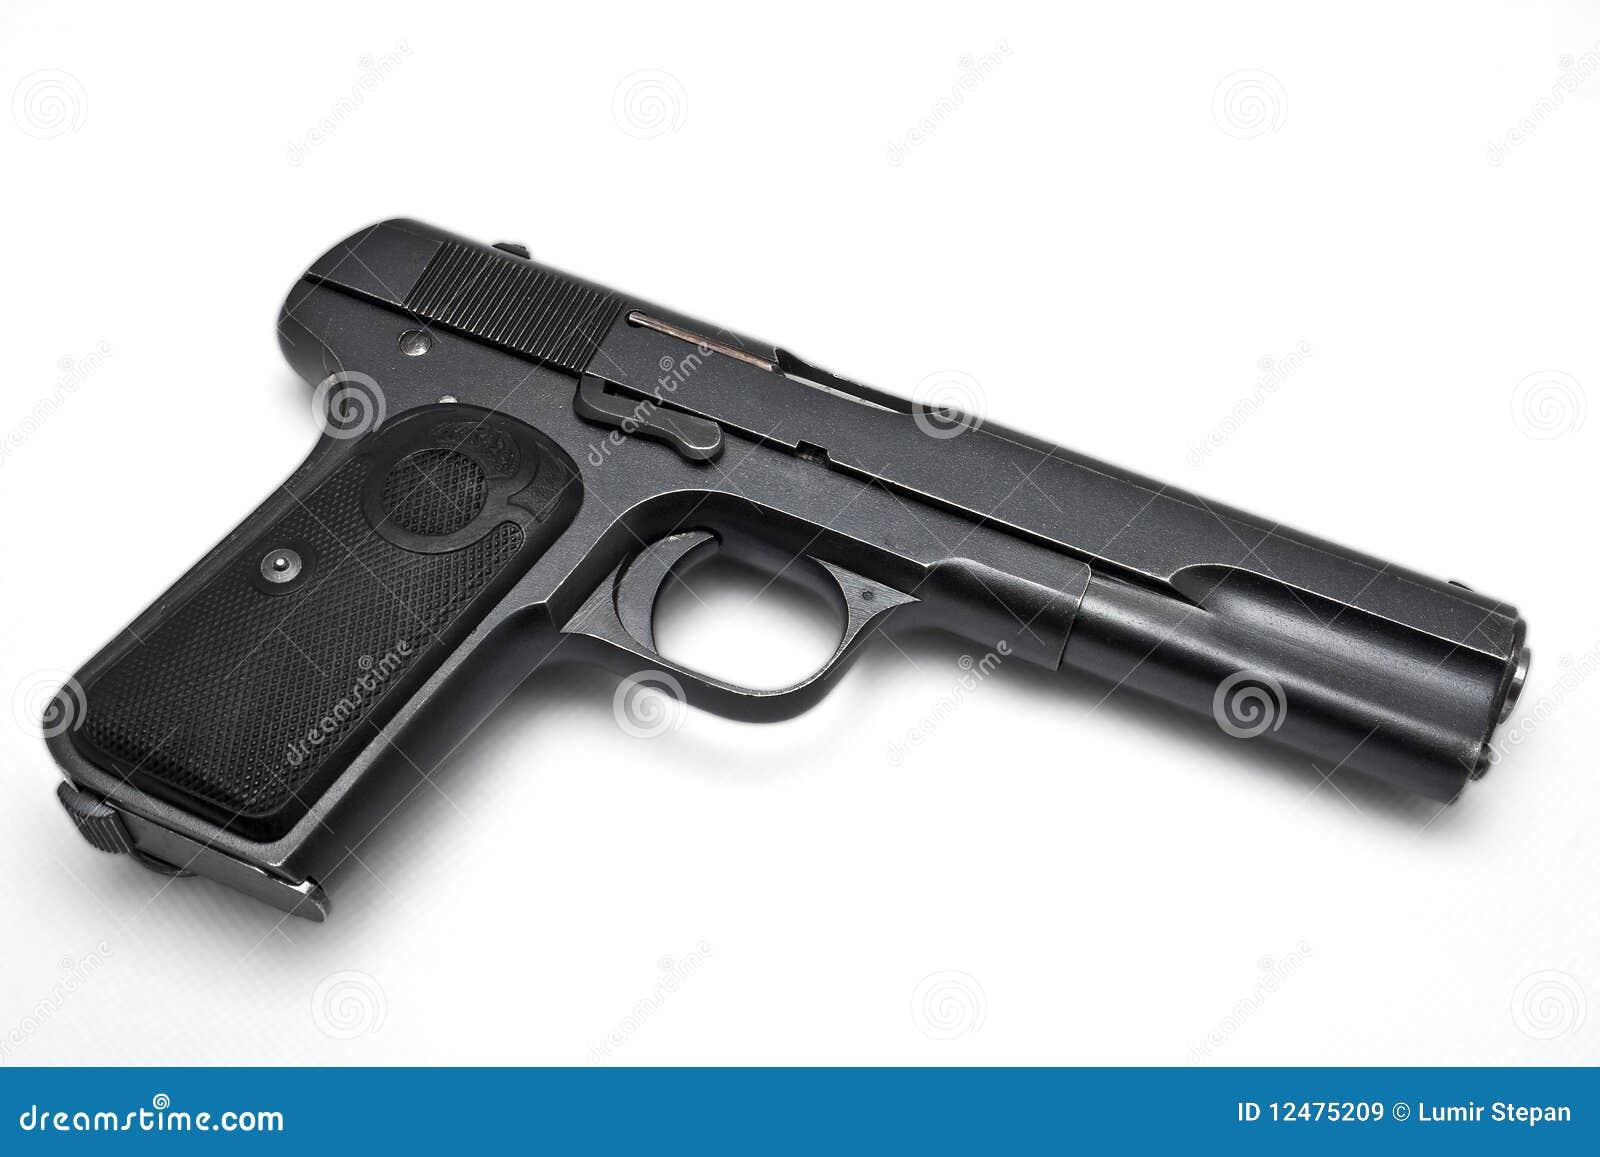 gun white background - photo #11